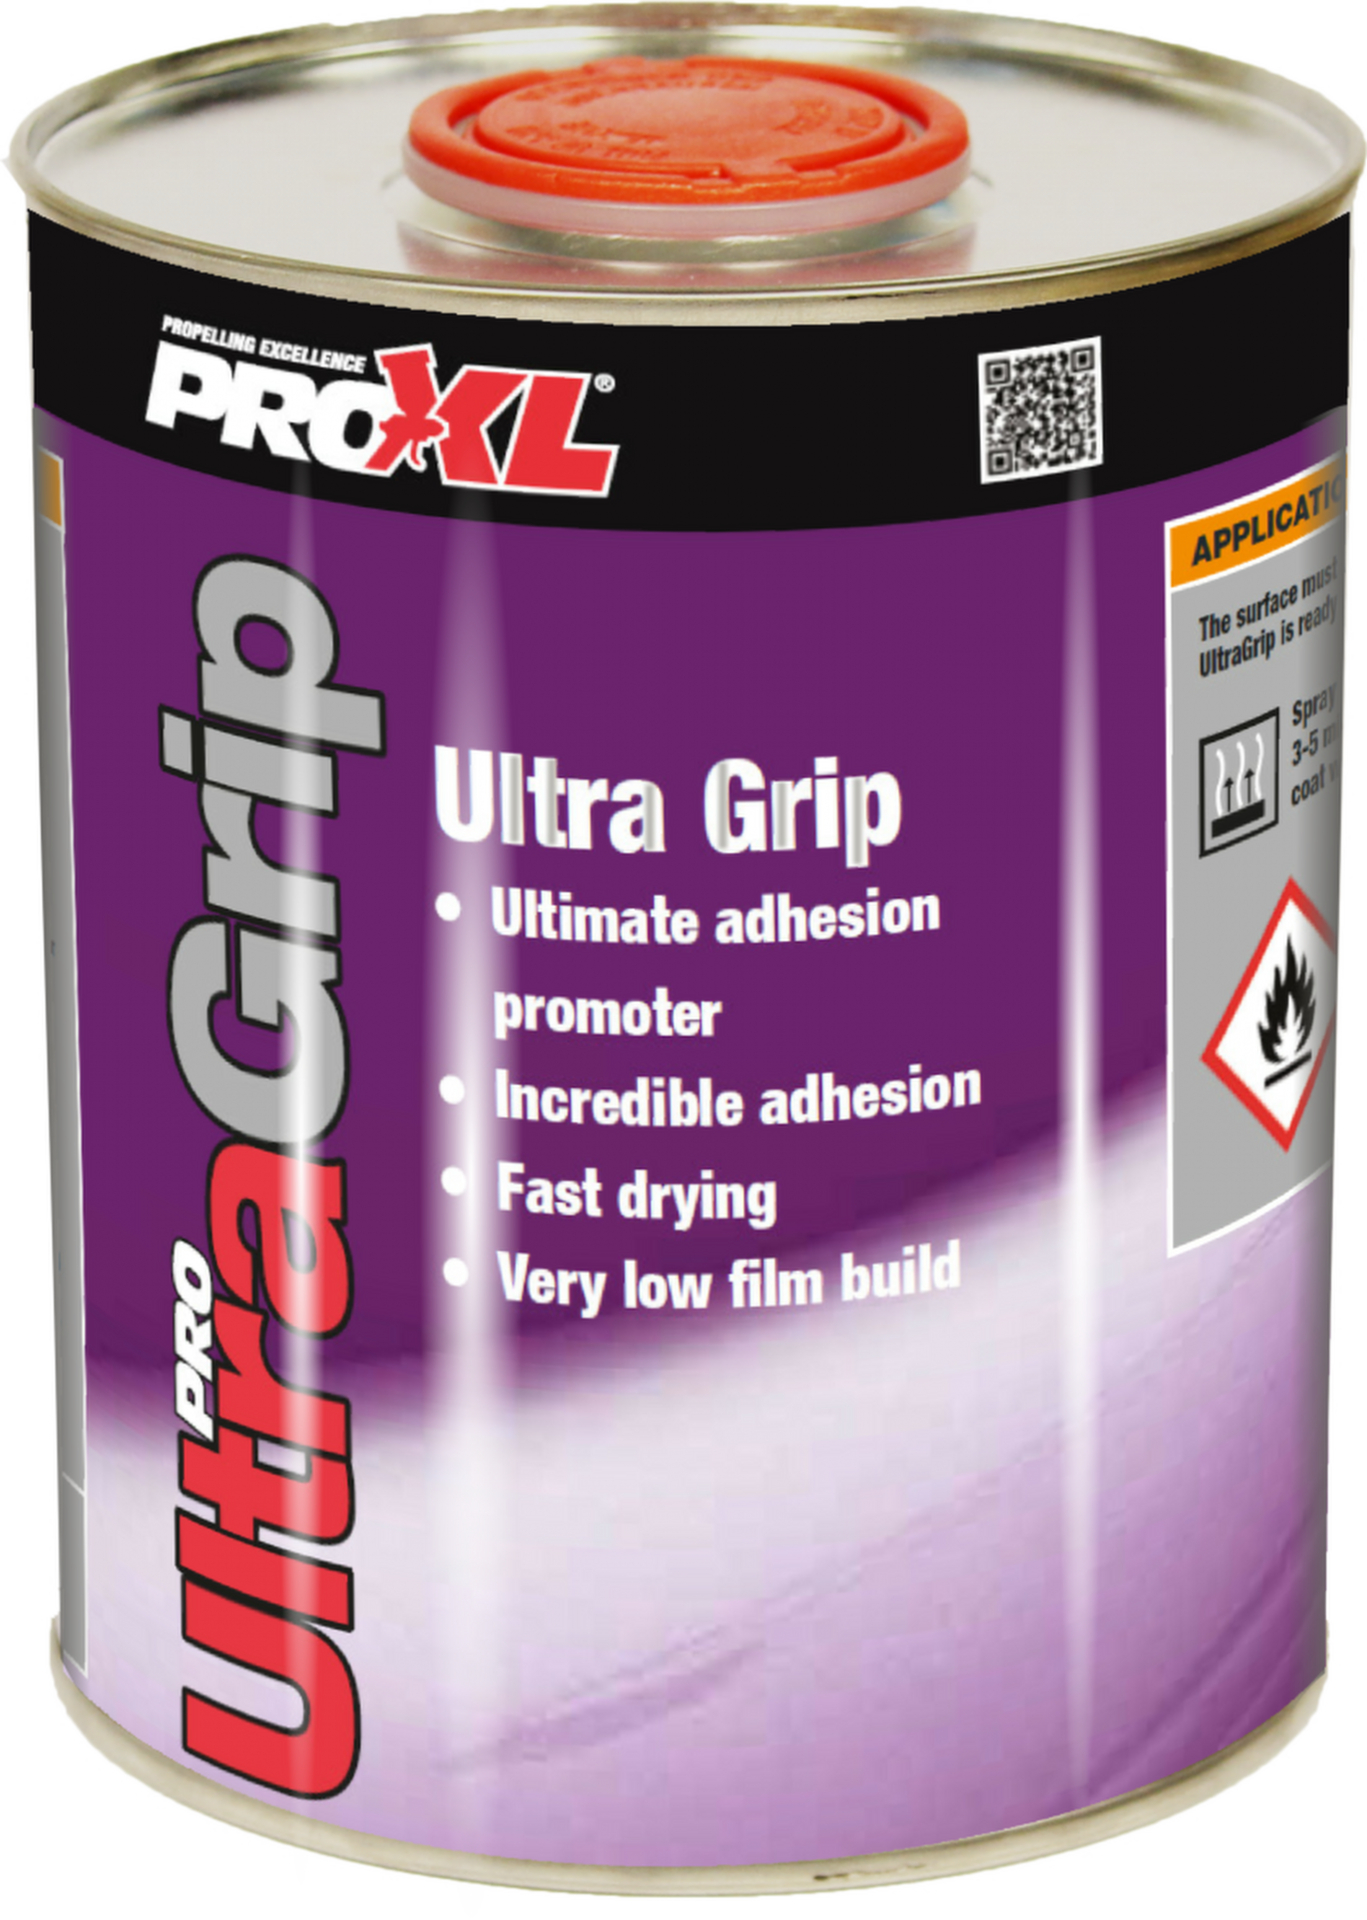 UltraGrip Adhesion Promoter (1lt) Product Image